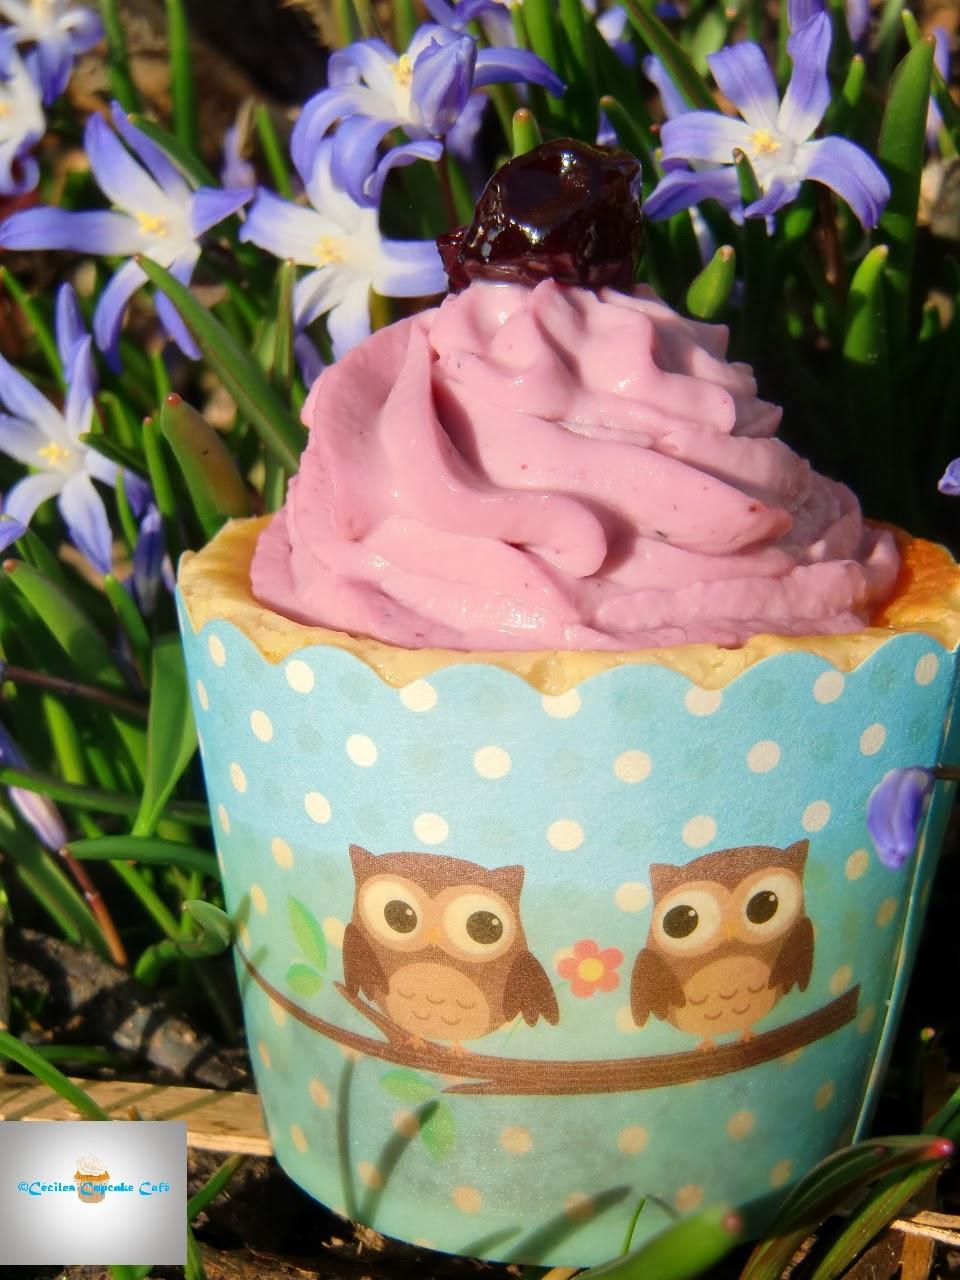 http://cecilecupcakecafe.blogspot.de/2014/03/lemon-cheesecake-cupcakes-mit-schwarzem.html